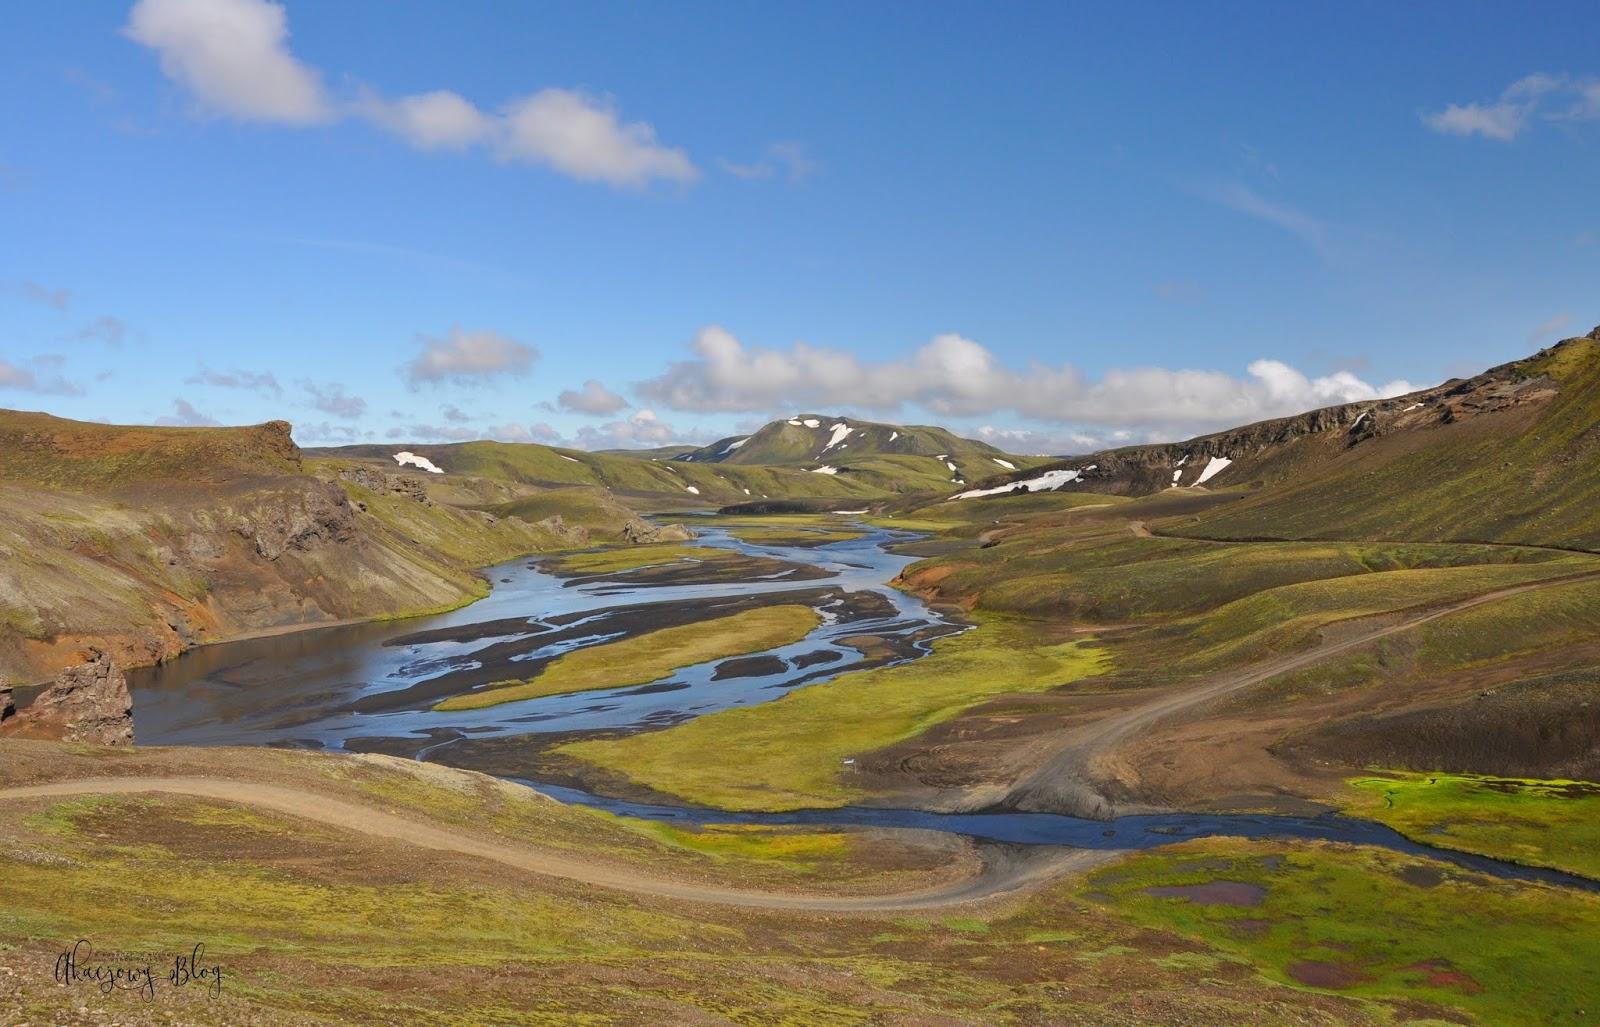 Islandia, w drodze do Landmannalaugar.